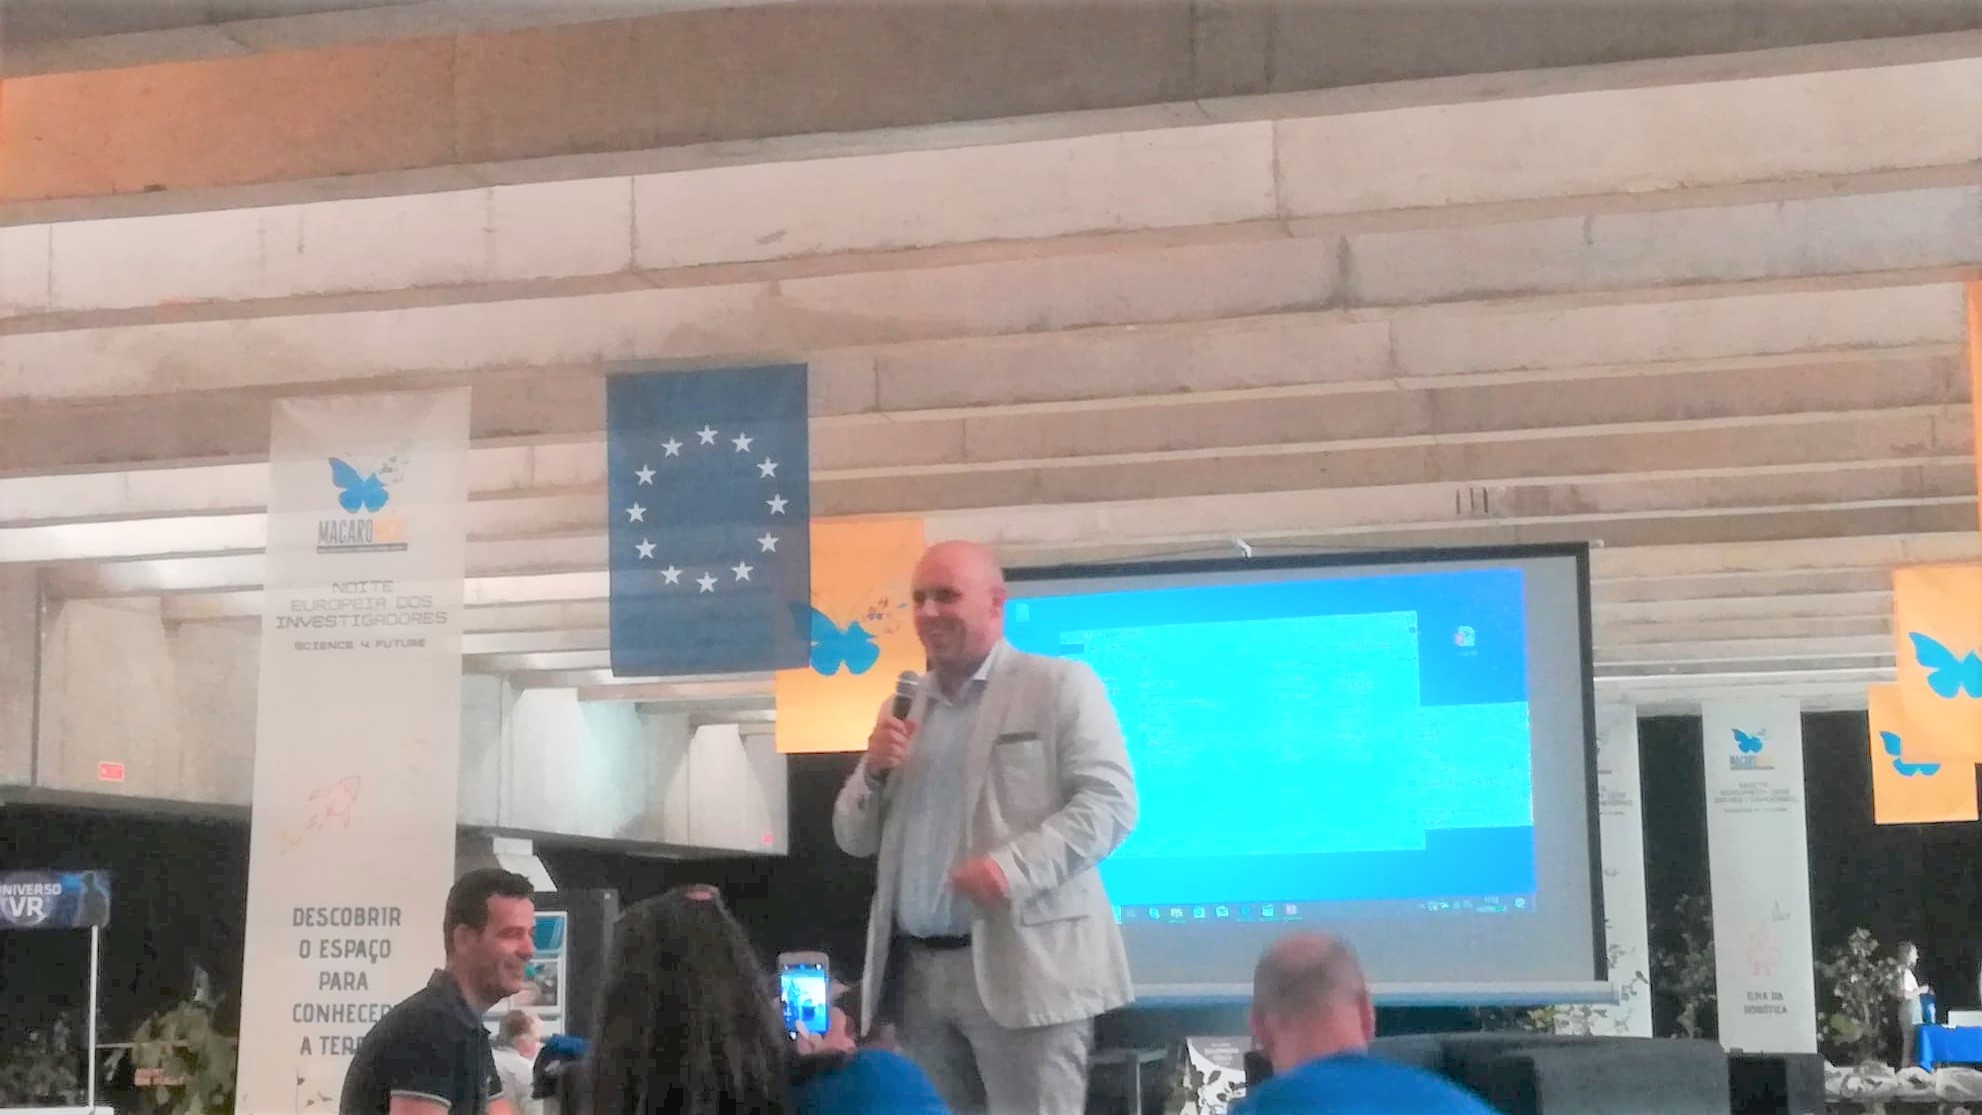 Governo dos Açores quer estender Noite Europeia dos Investigadores a todo o arquipélago